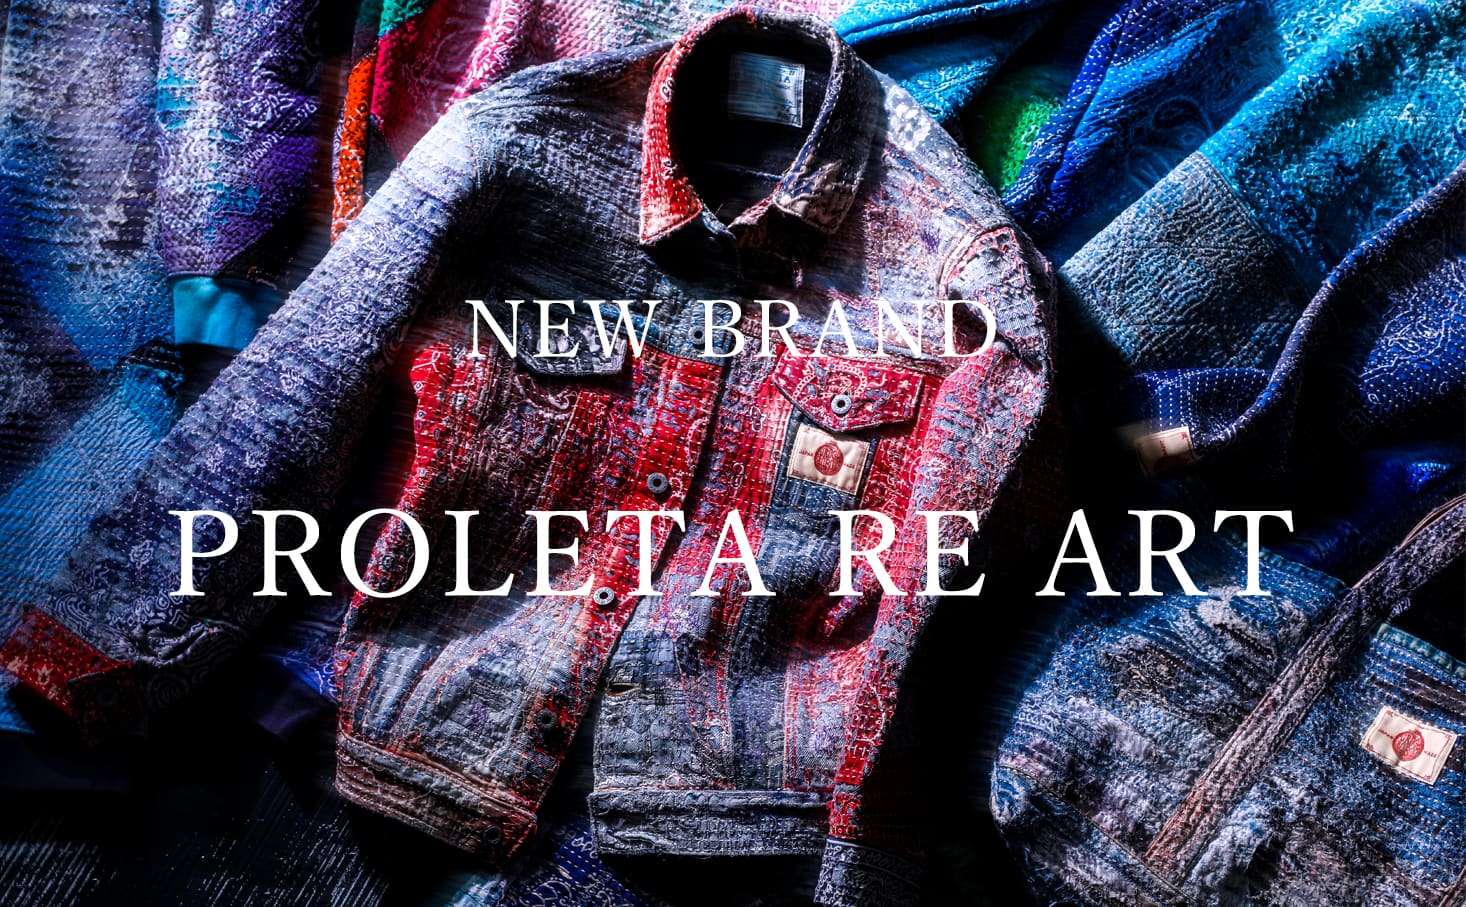 PROLETA RE ART(プロレタ リ アート)  2021-22AW(秋冬)コレクション